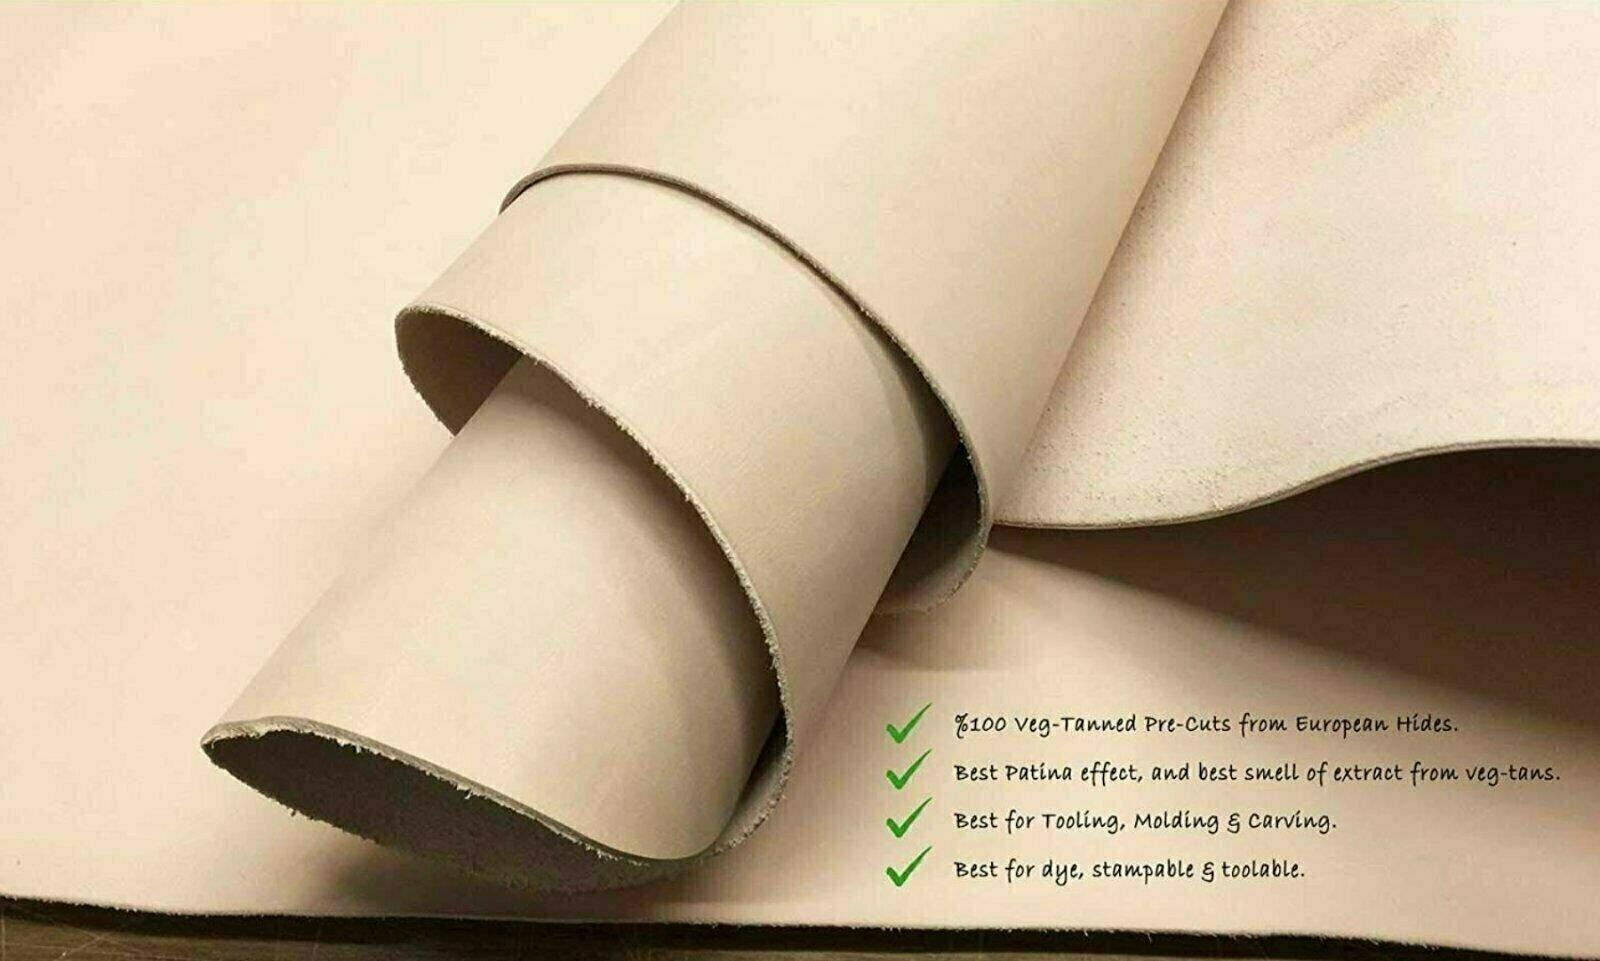 Natural Full Grain Leather Veg Tan Shoulder 8//9 oz. 16-18 sq.ft. 3.2-3.6mm